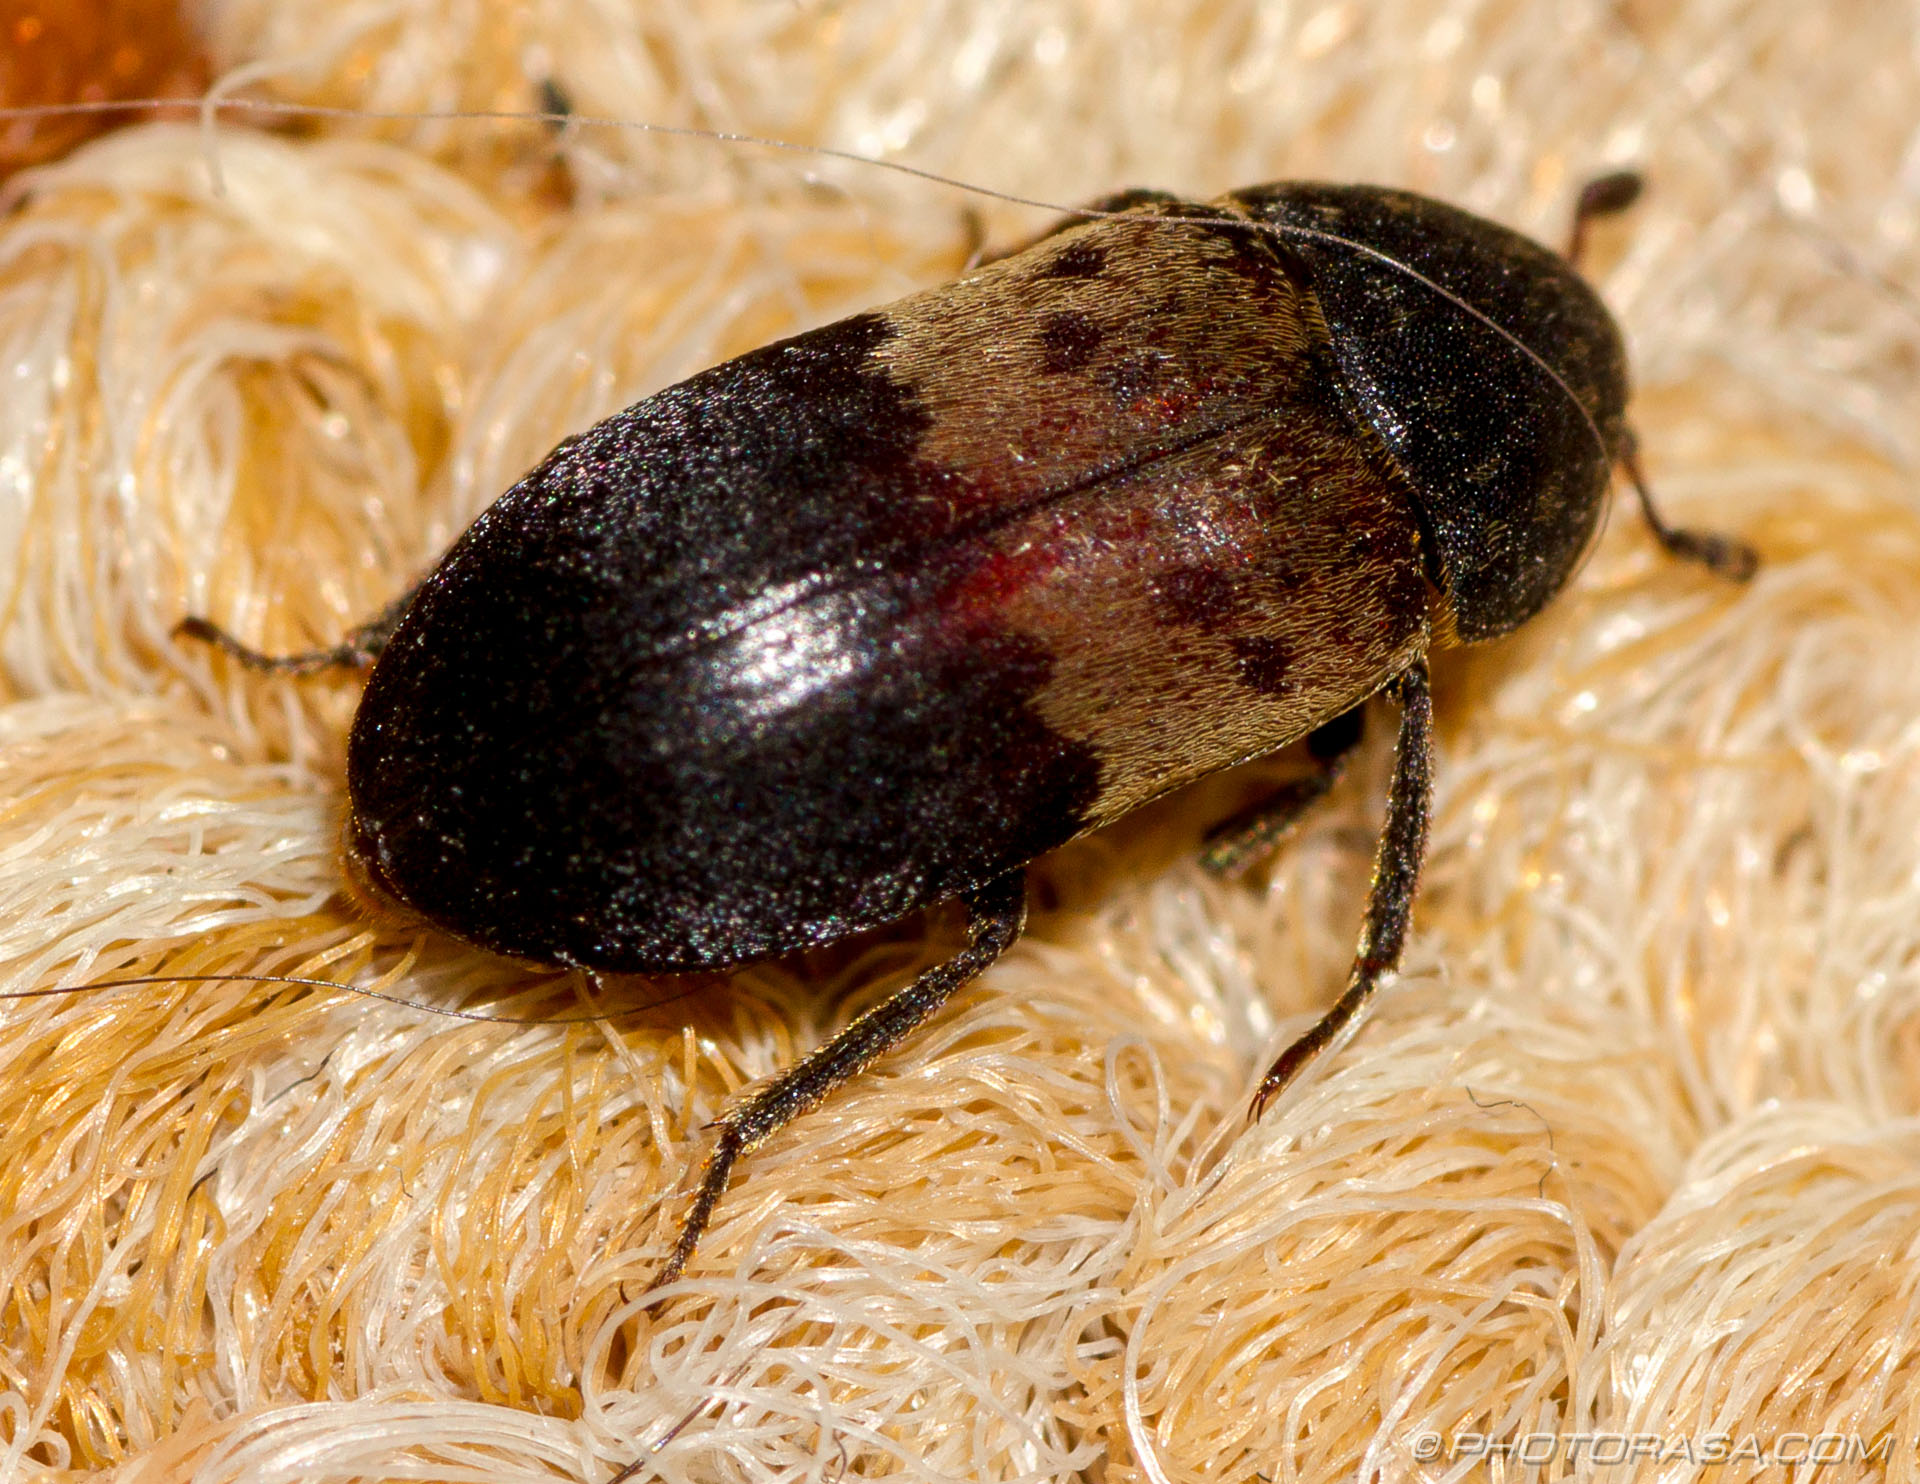 http://photorasa.com/beetles/larder-beetle/